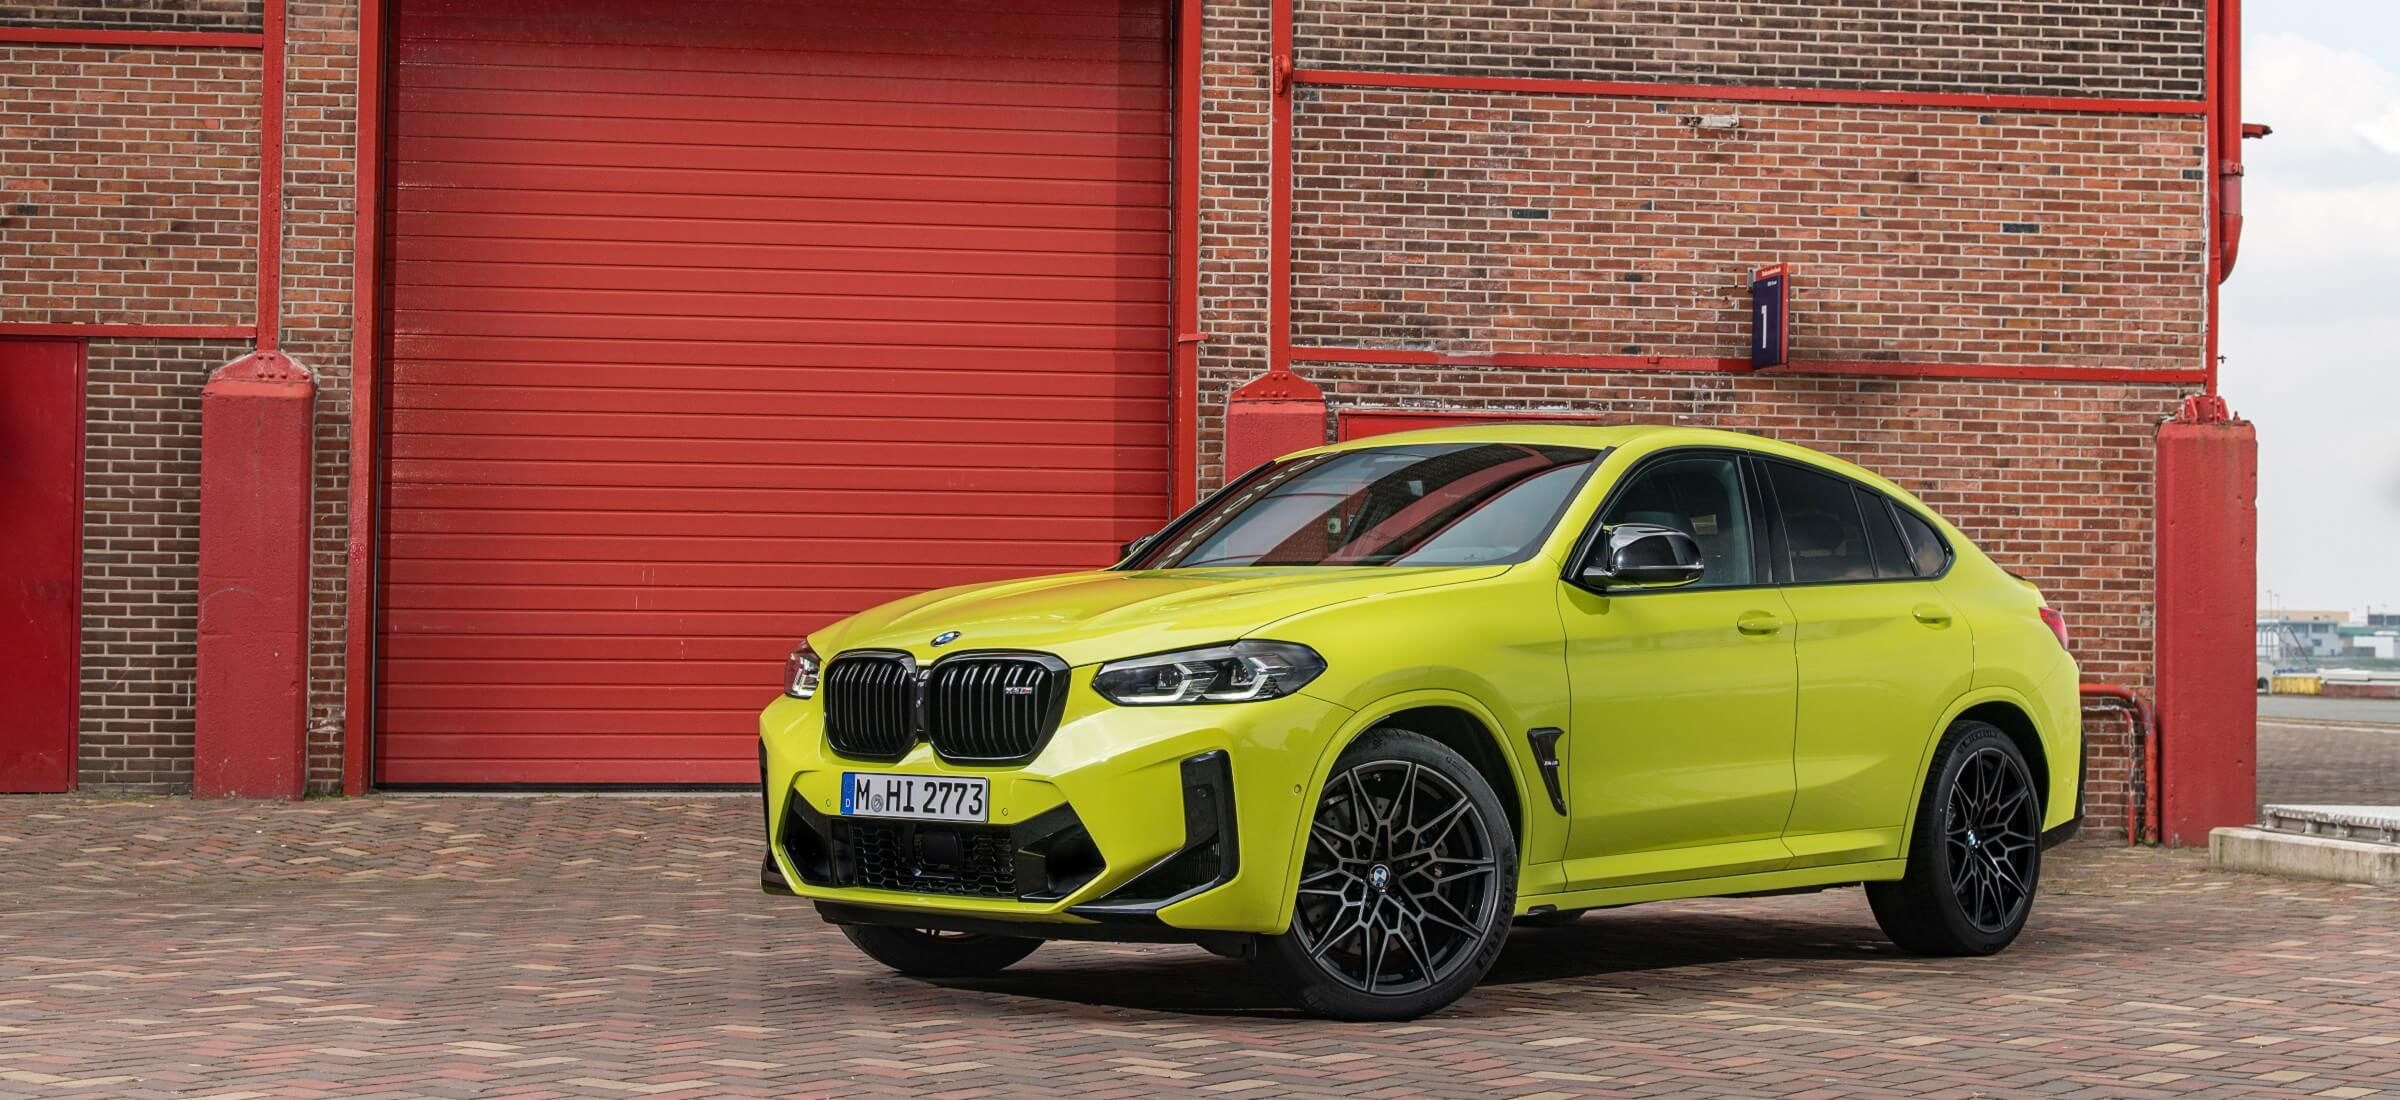 BMW X4M Competition Frontansicht Header